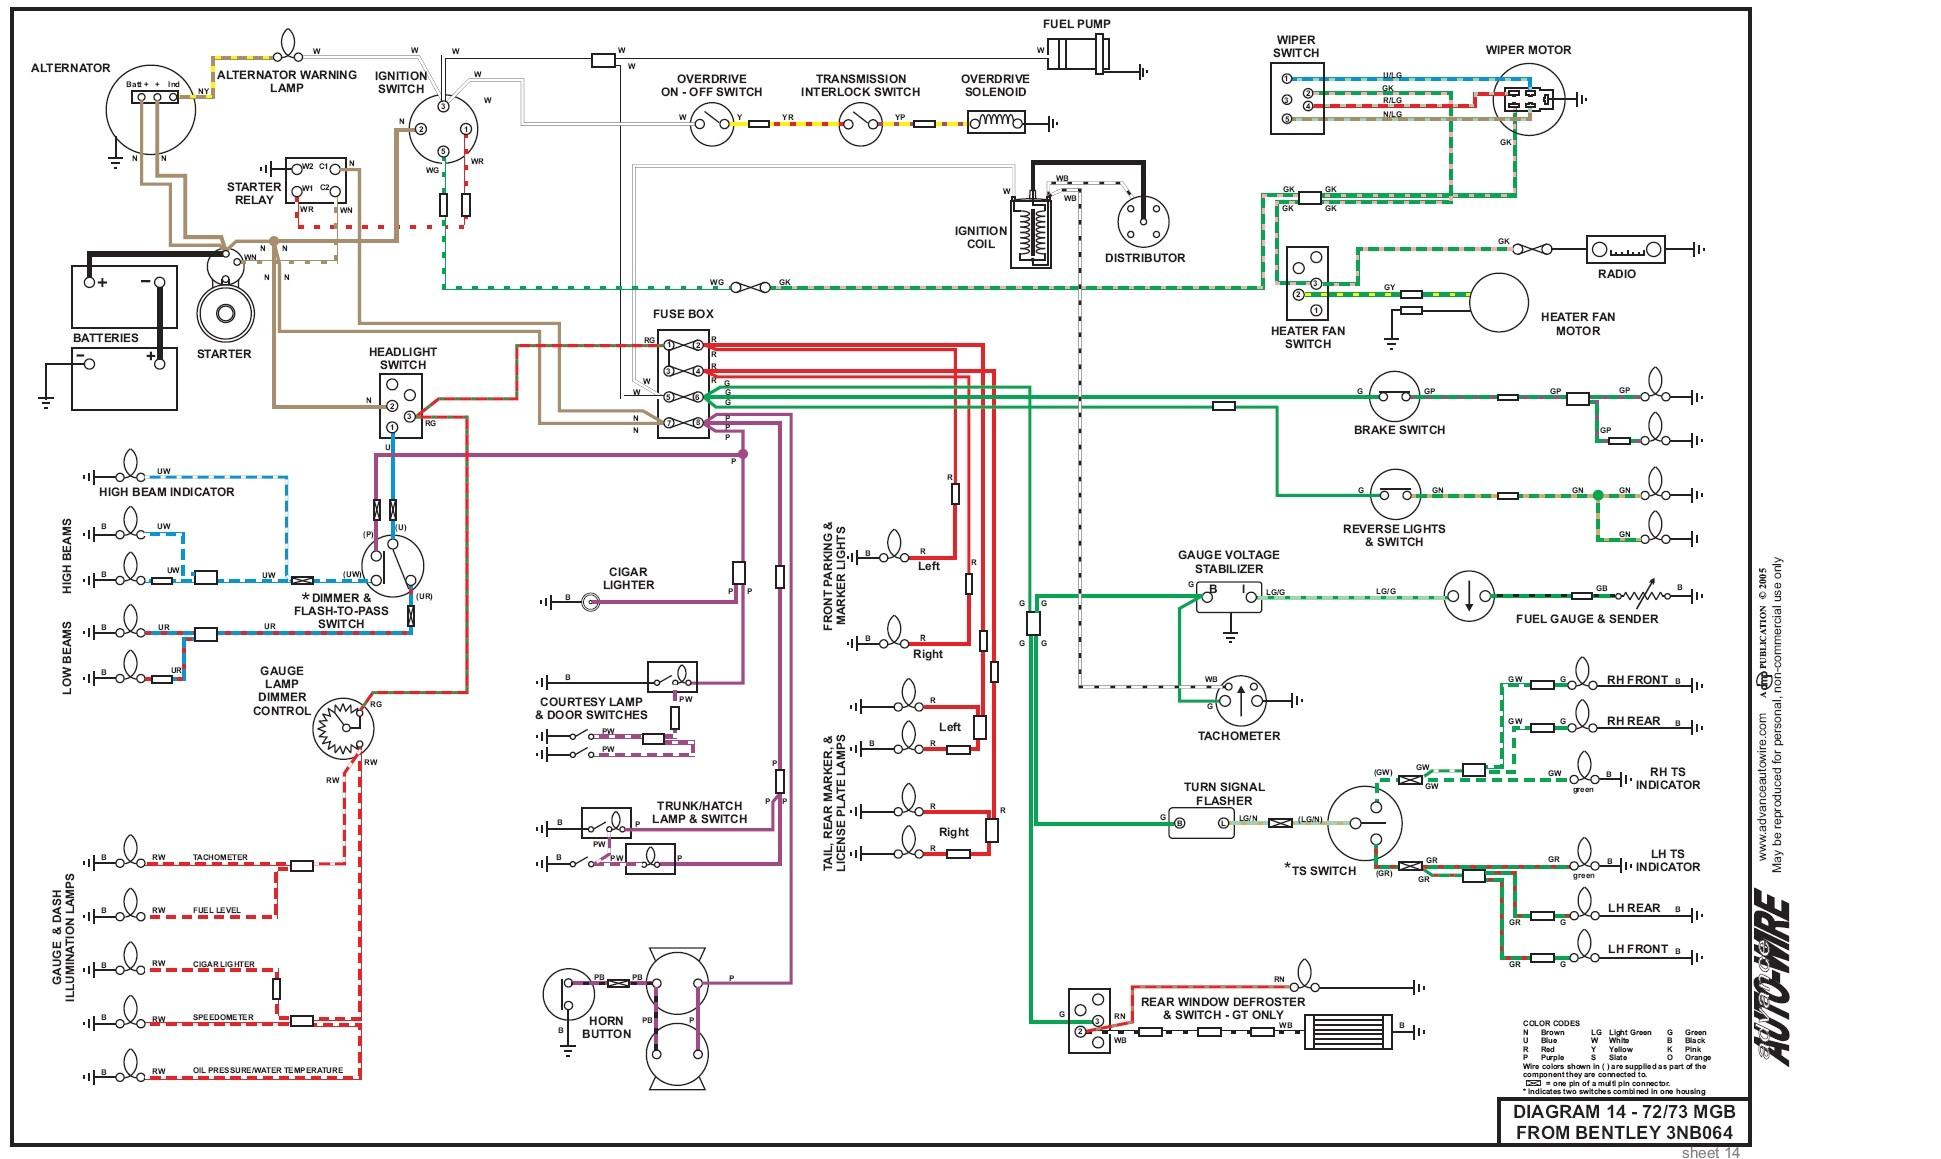 1976 mg midget electrical diagram wiring diagram meta 1976 mg wiring diagram